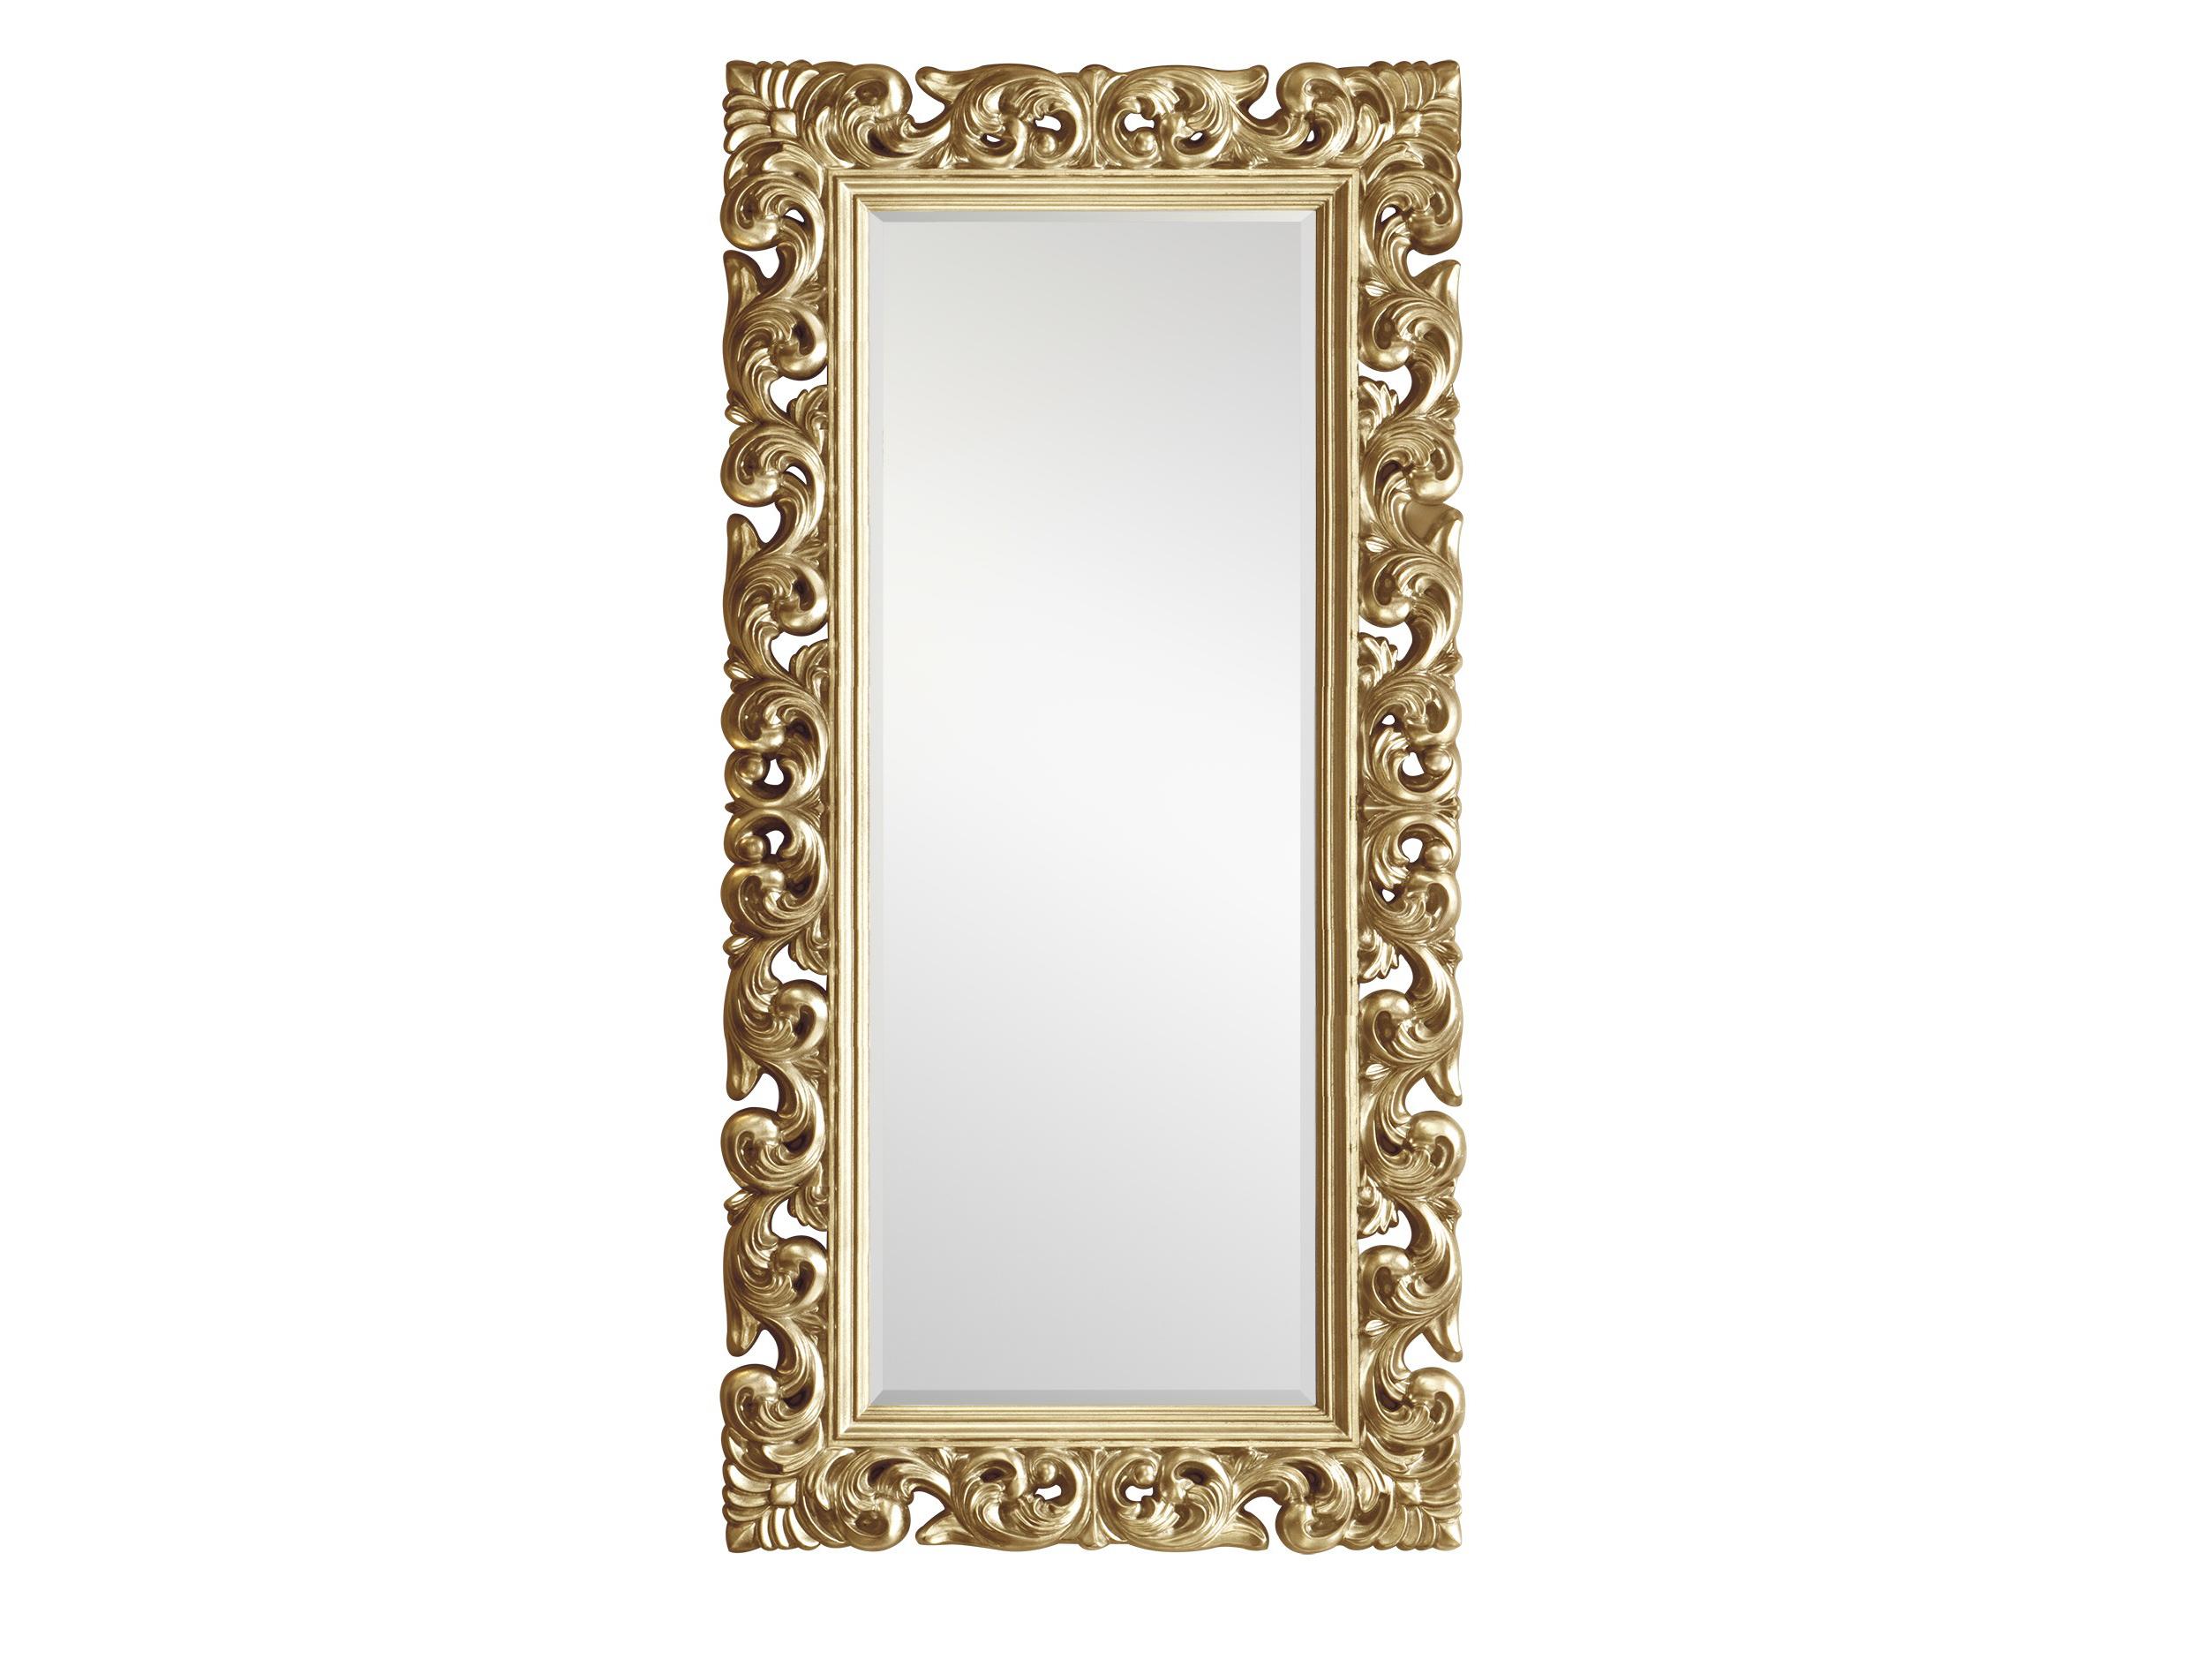 ЗеркалоНастенные зеркала<br><br><br>Material: Пластик<br>Ширина см: 80<br>Высота см: 190<br>Глубина см: 6